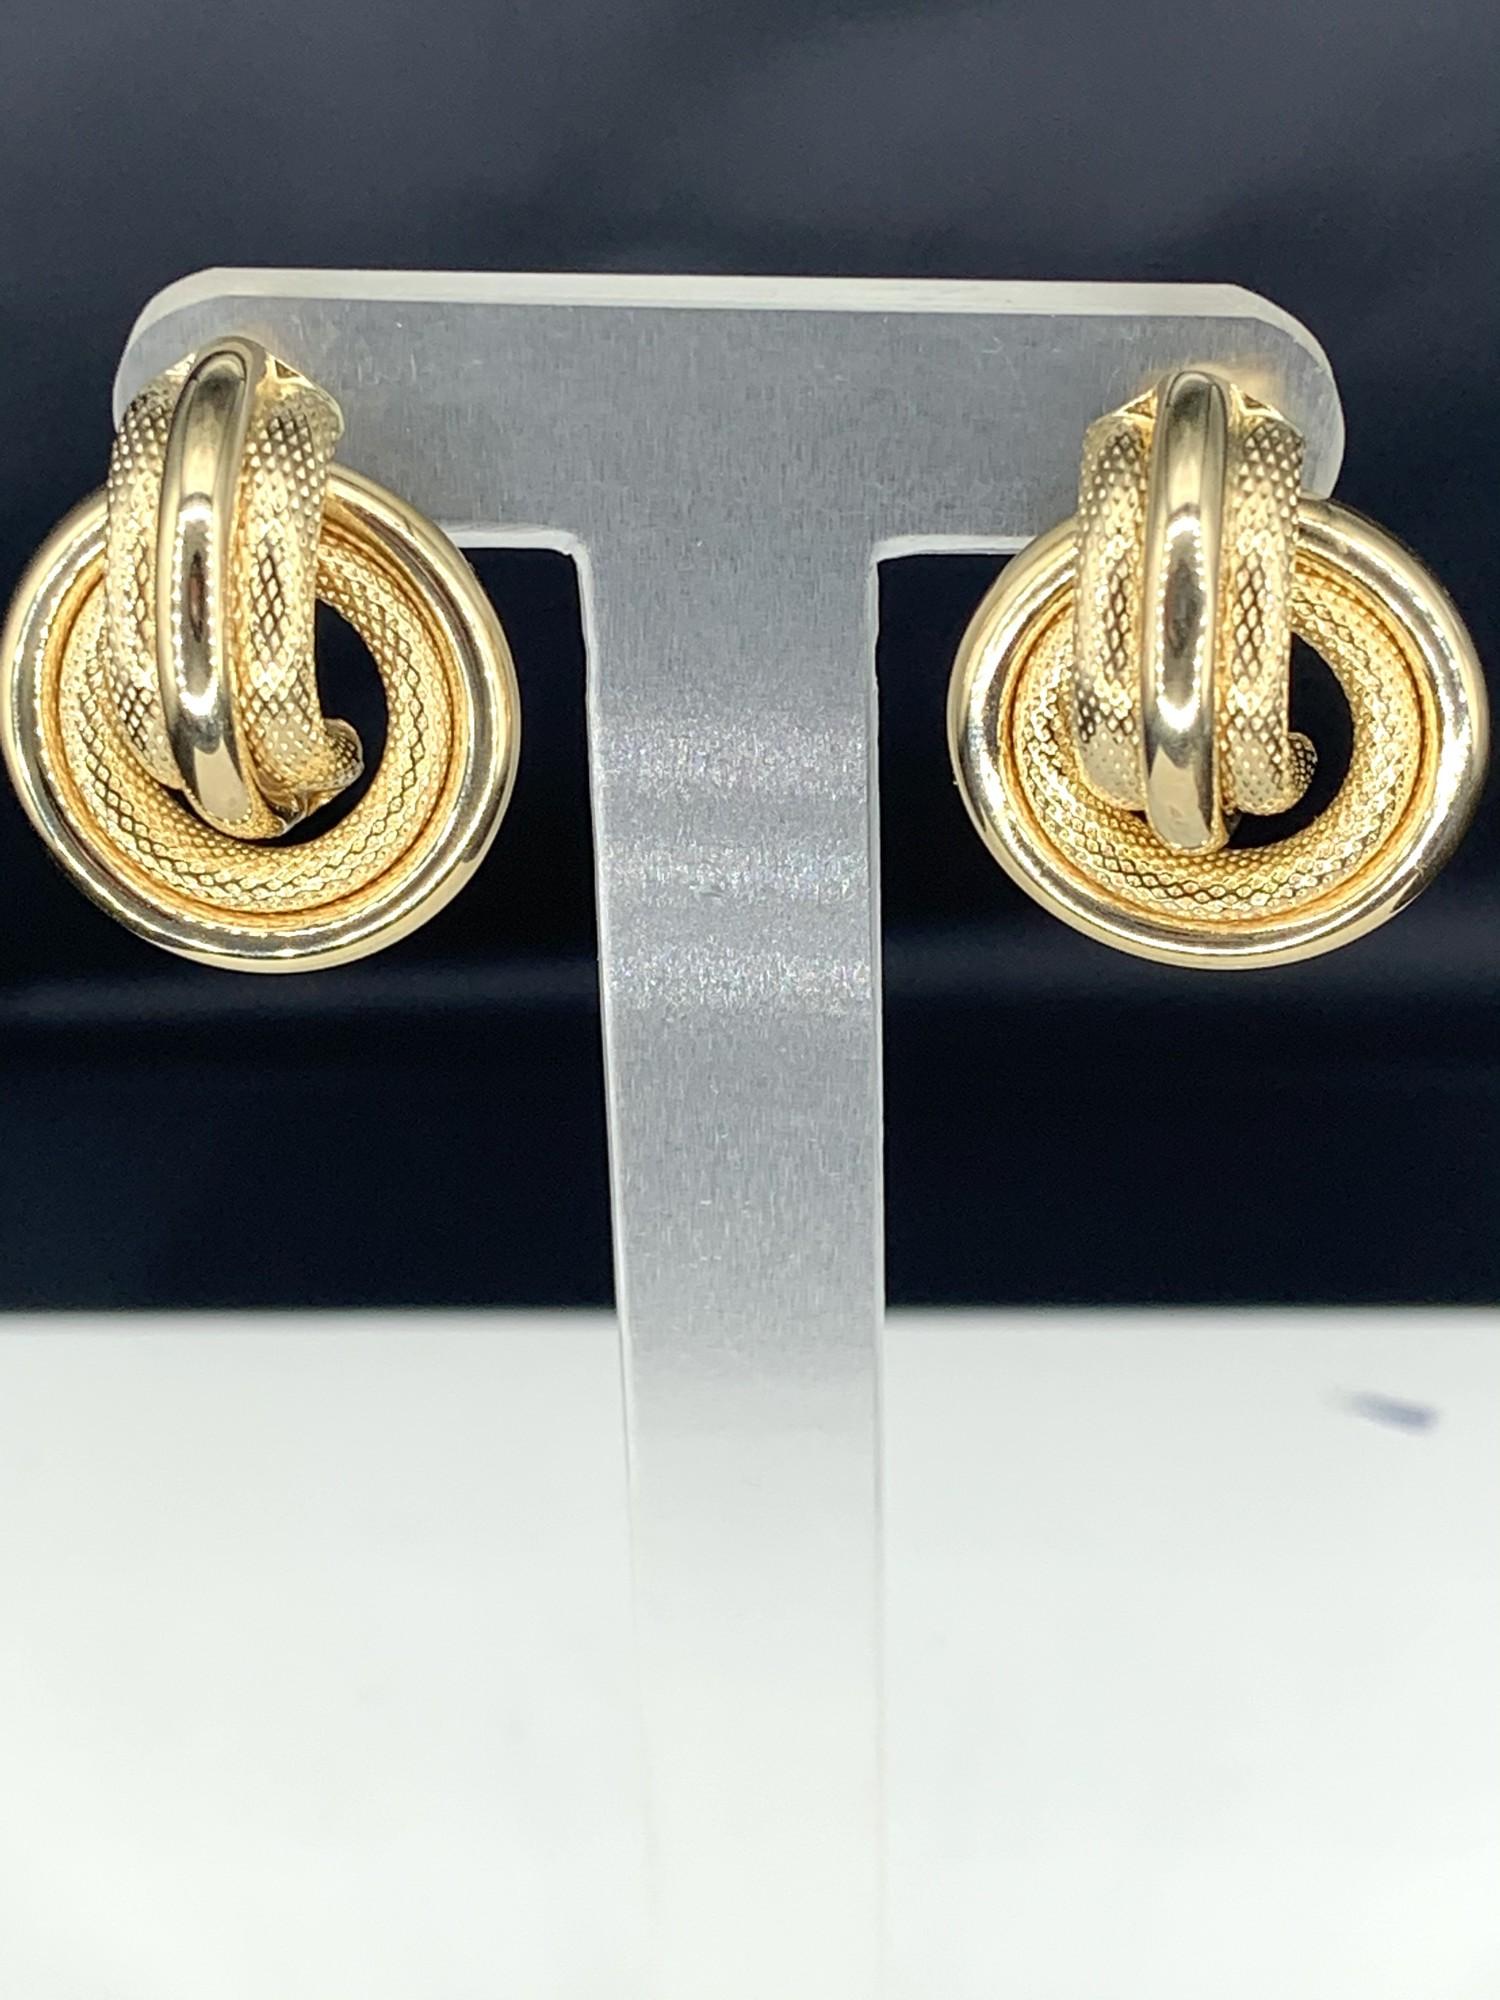 Doorknocker Earrings<br /> Mesh and Polished Combination<br /> 14 karat Yellow Gold<br /> Post Backs